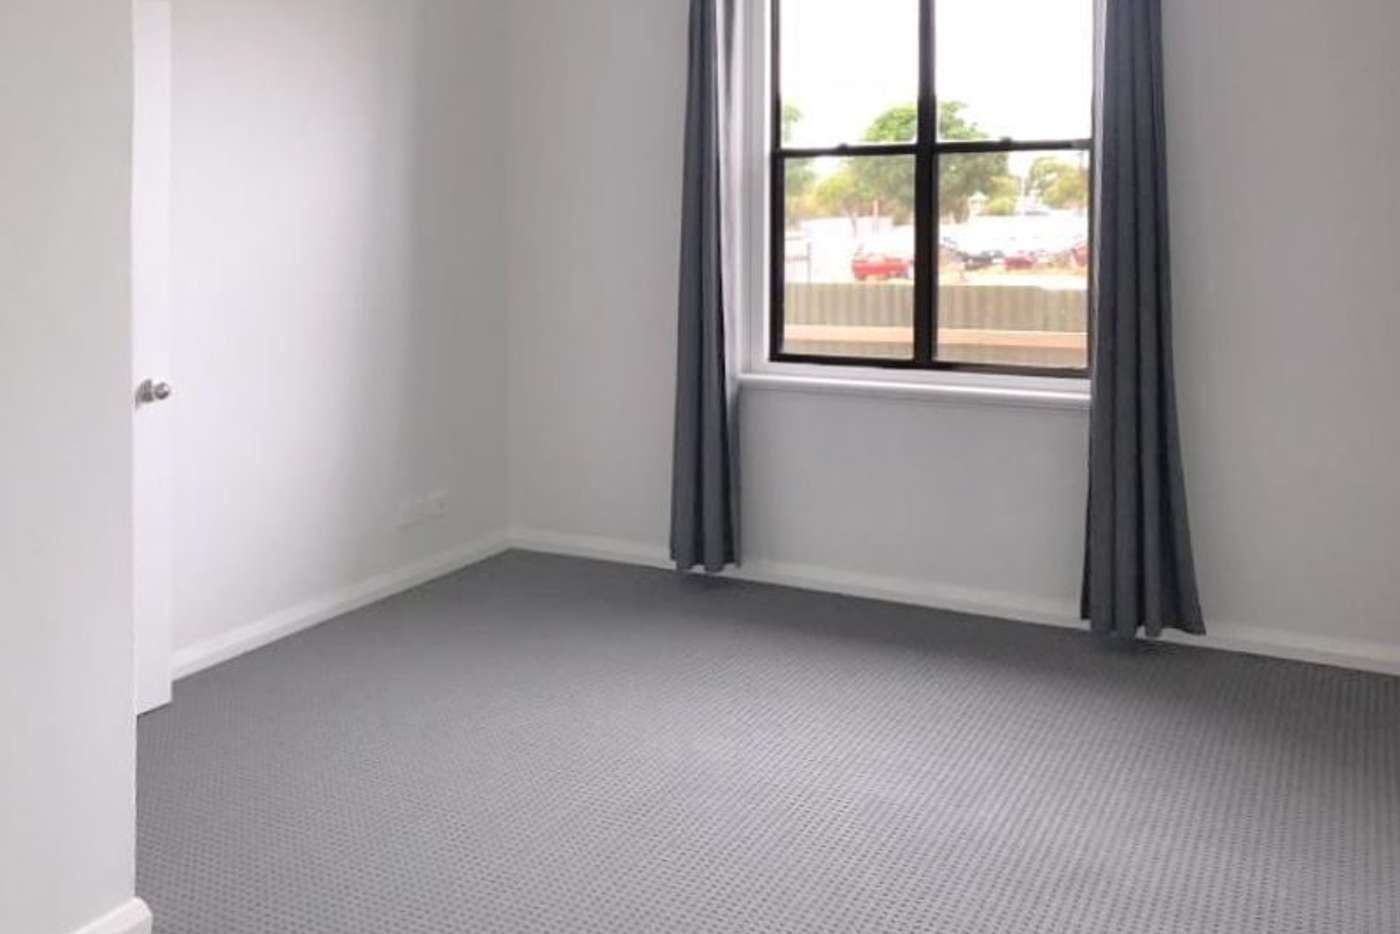 Sixth view of Homely house listing, 53 Hill Street, Murray Bridge SA 5253